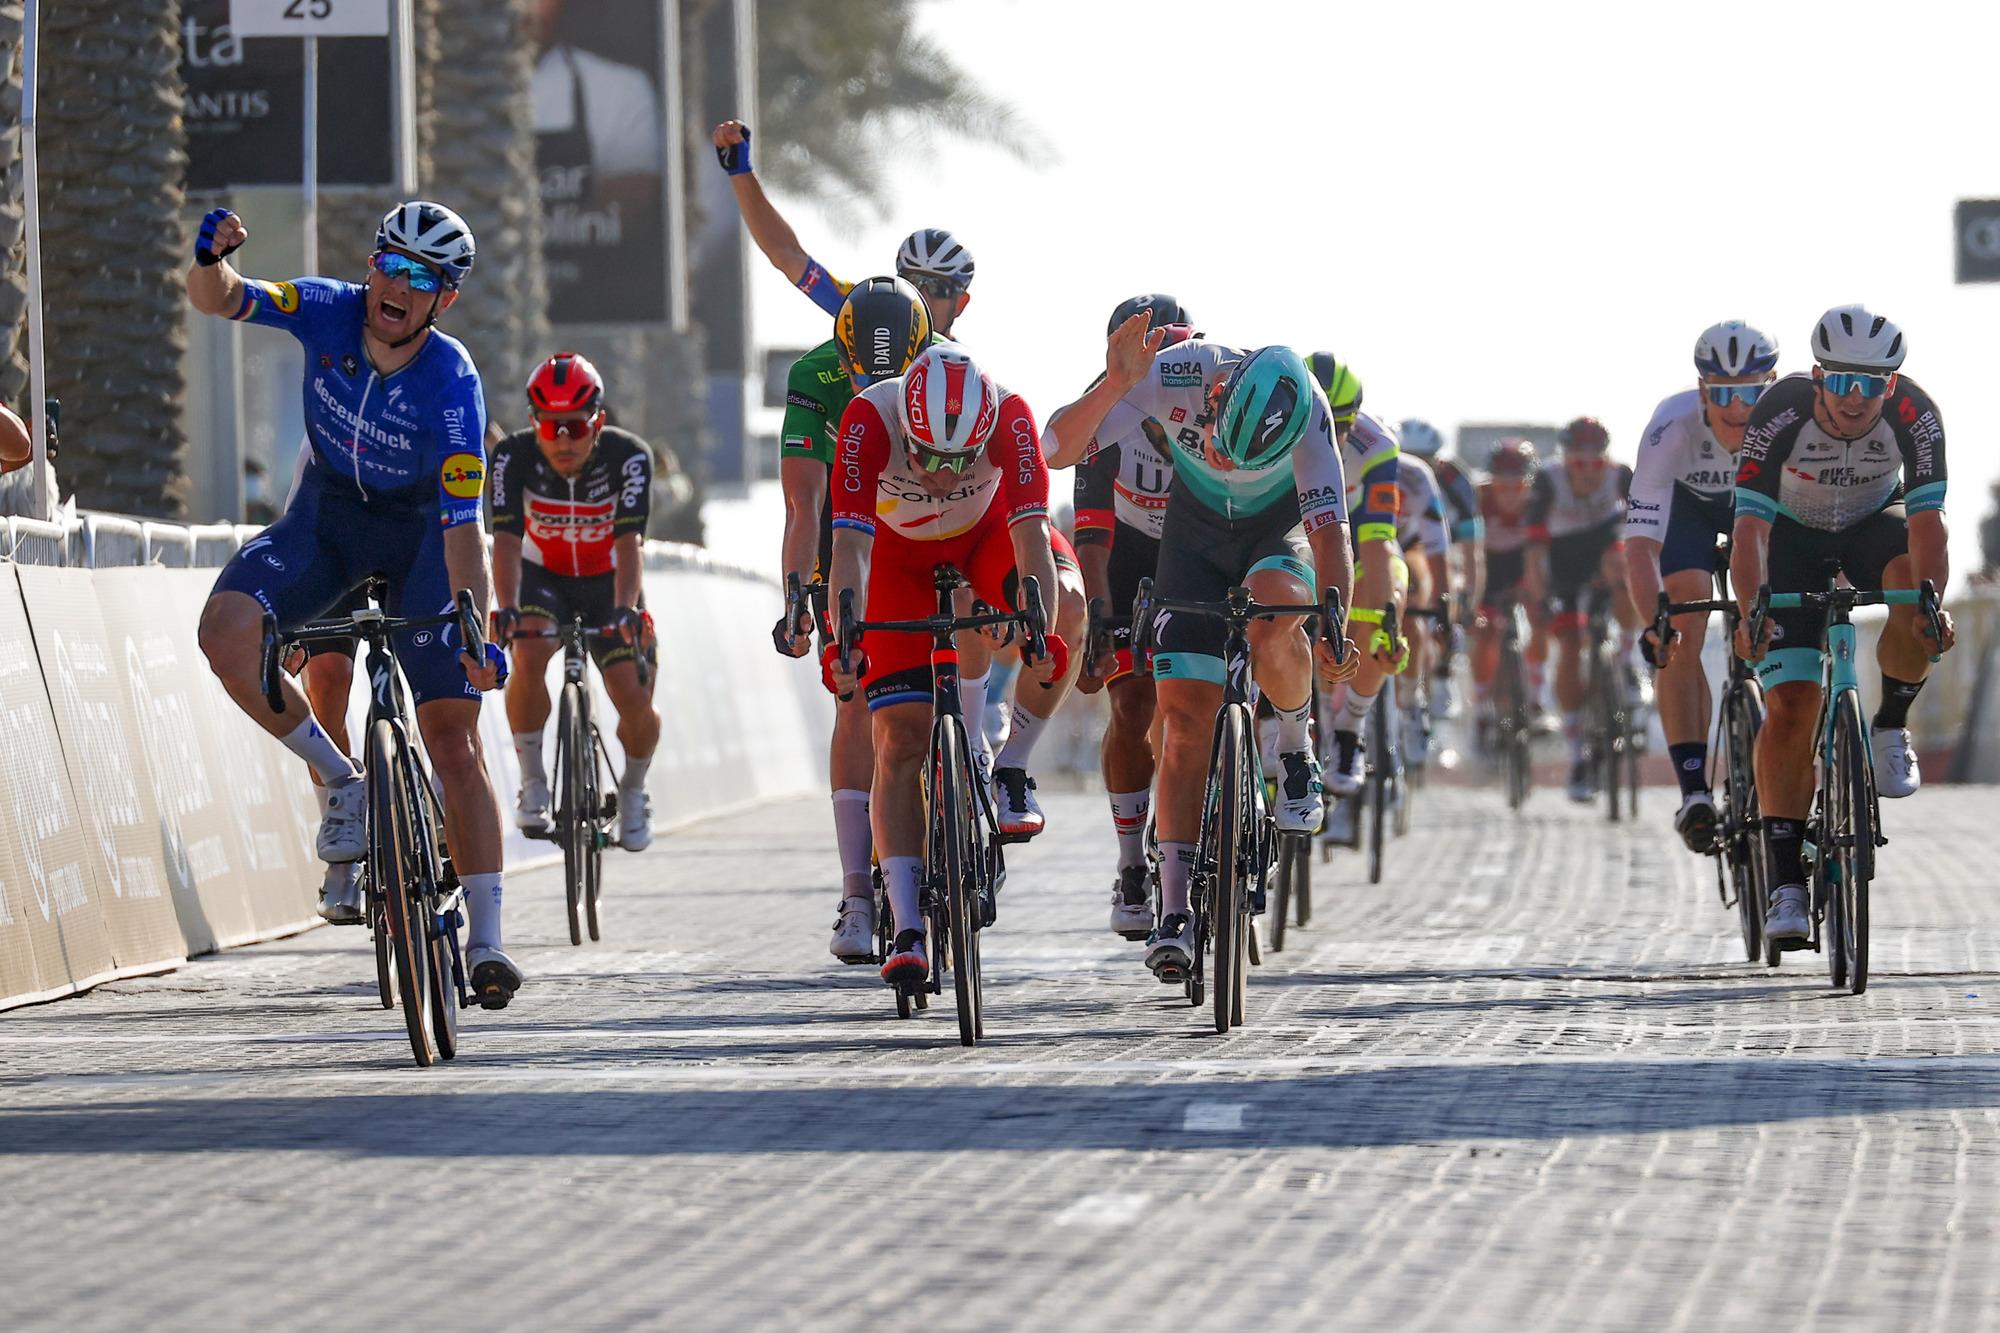 UAE Tour 2021 - 3th Edition - 6th stage Deira Island - Palm Jumeirah 165 km - 25/02/2021 - Sam Bennett (IRL - Deceuninck - Quick-Step) - Elia Viviani (ITA - Cofidis) - Pascal Ackermann (GER - Bora - Hansgrohe) - photo Luca Bettini/BettiniPhoto©2021